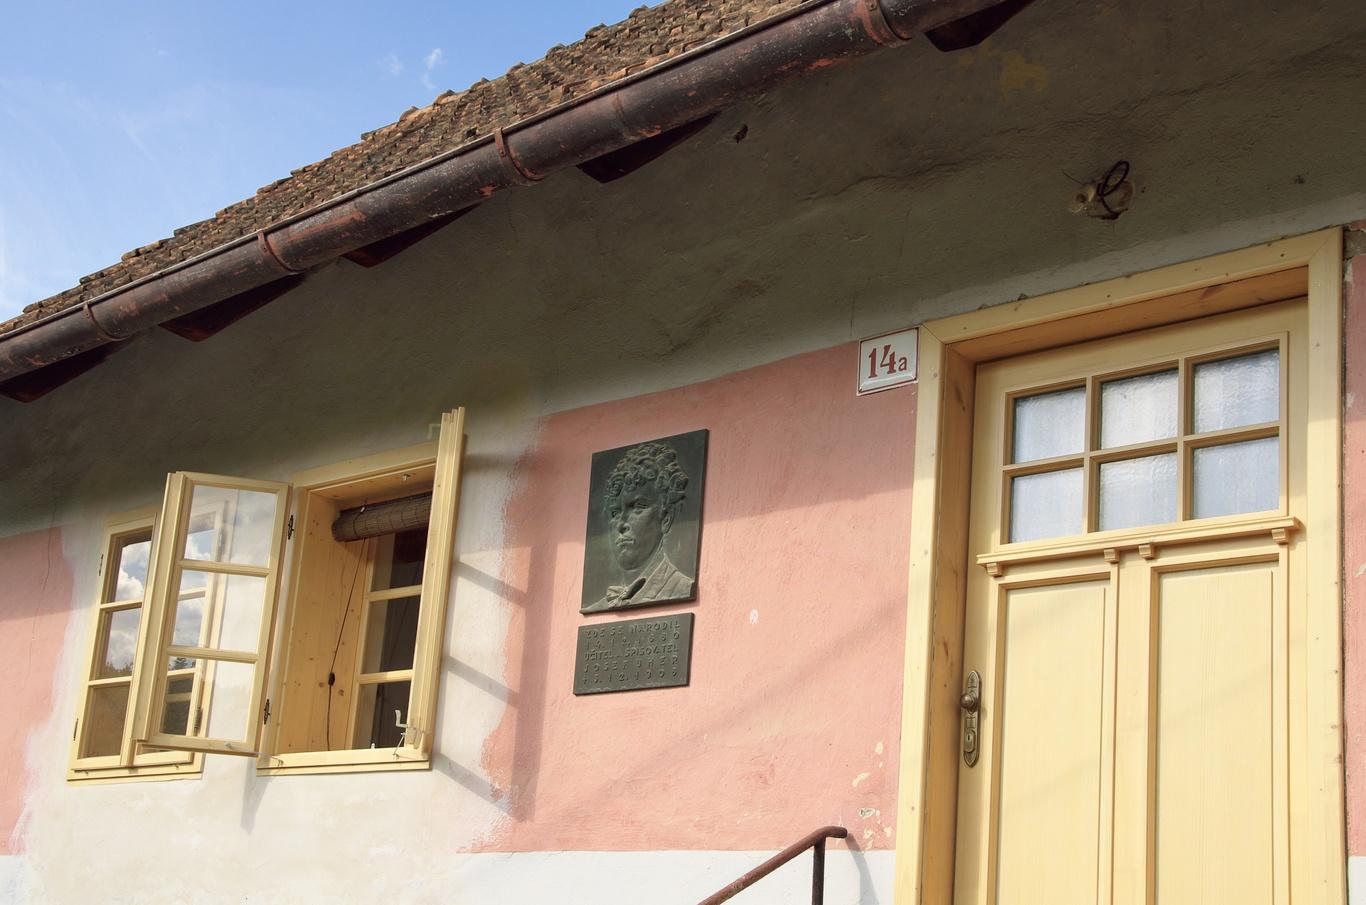 Rodný dům J. Uhra, Podolí